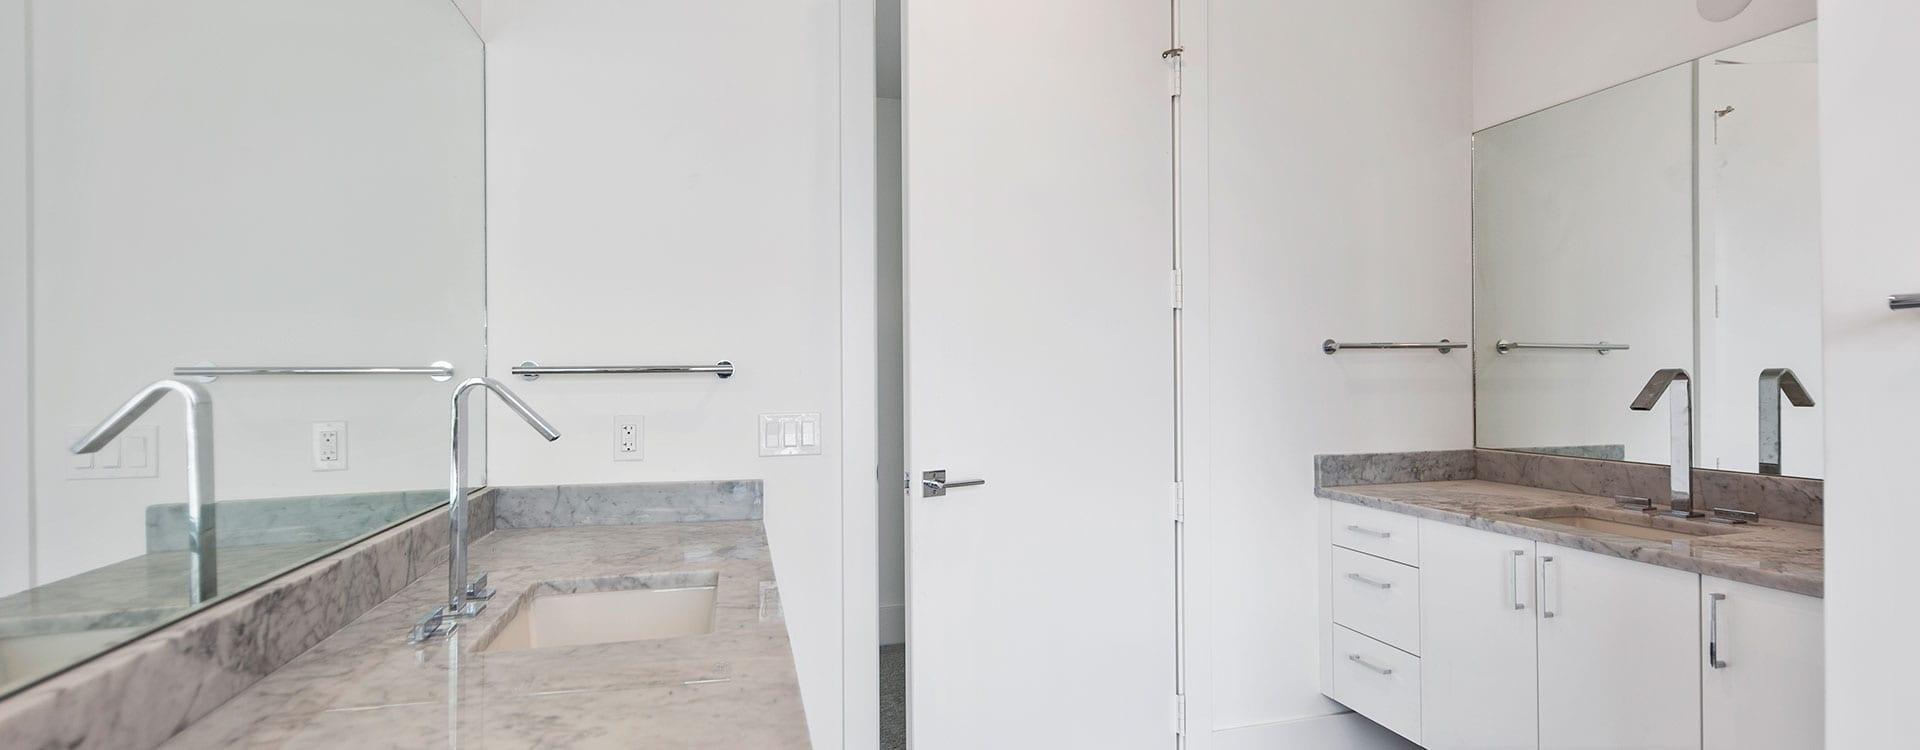 BLVD Sarasota Residence 1102 Bathroom double sinks